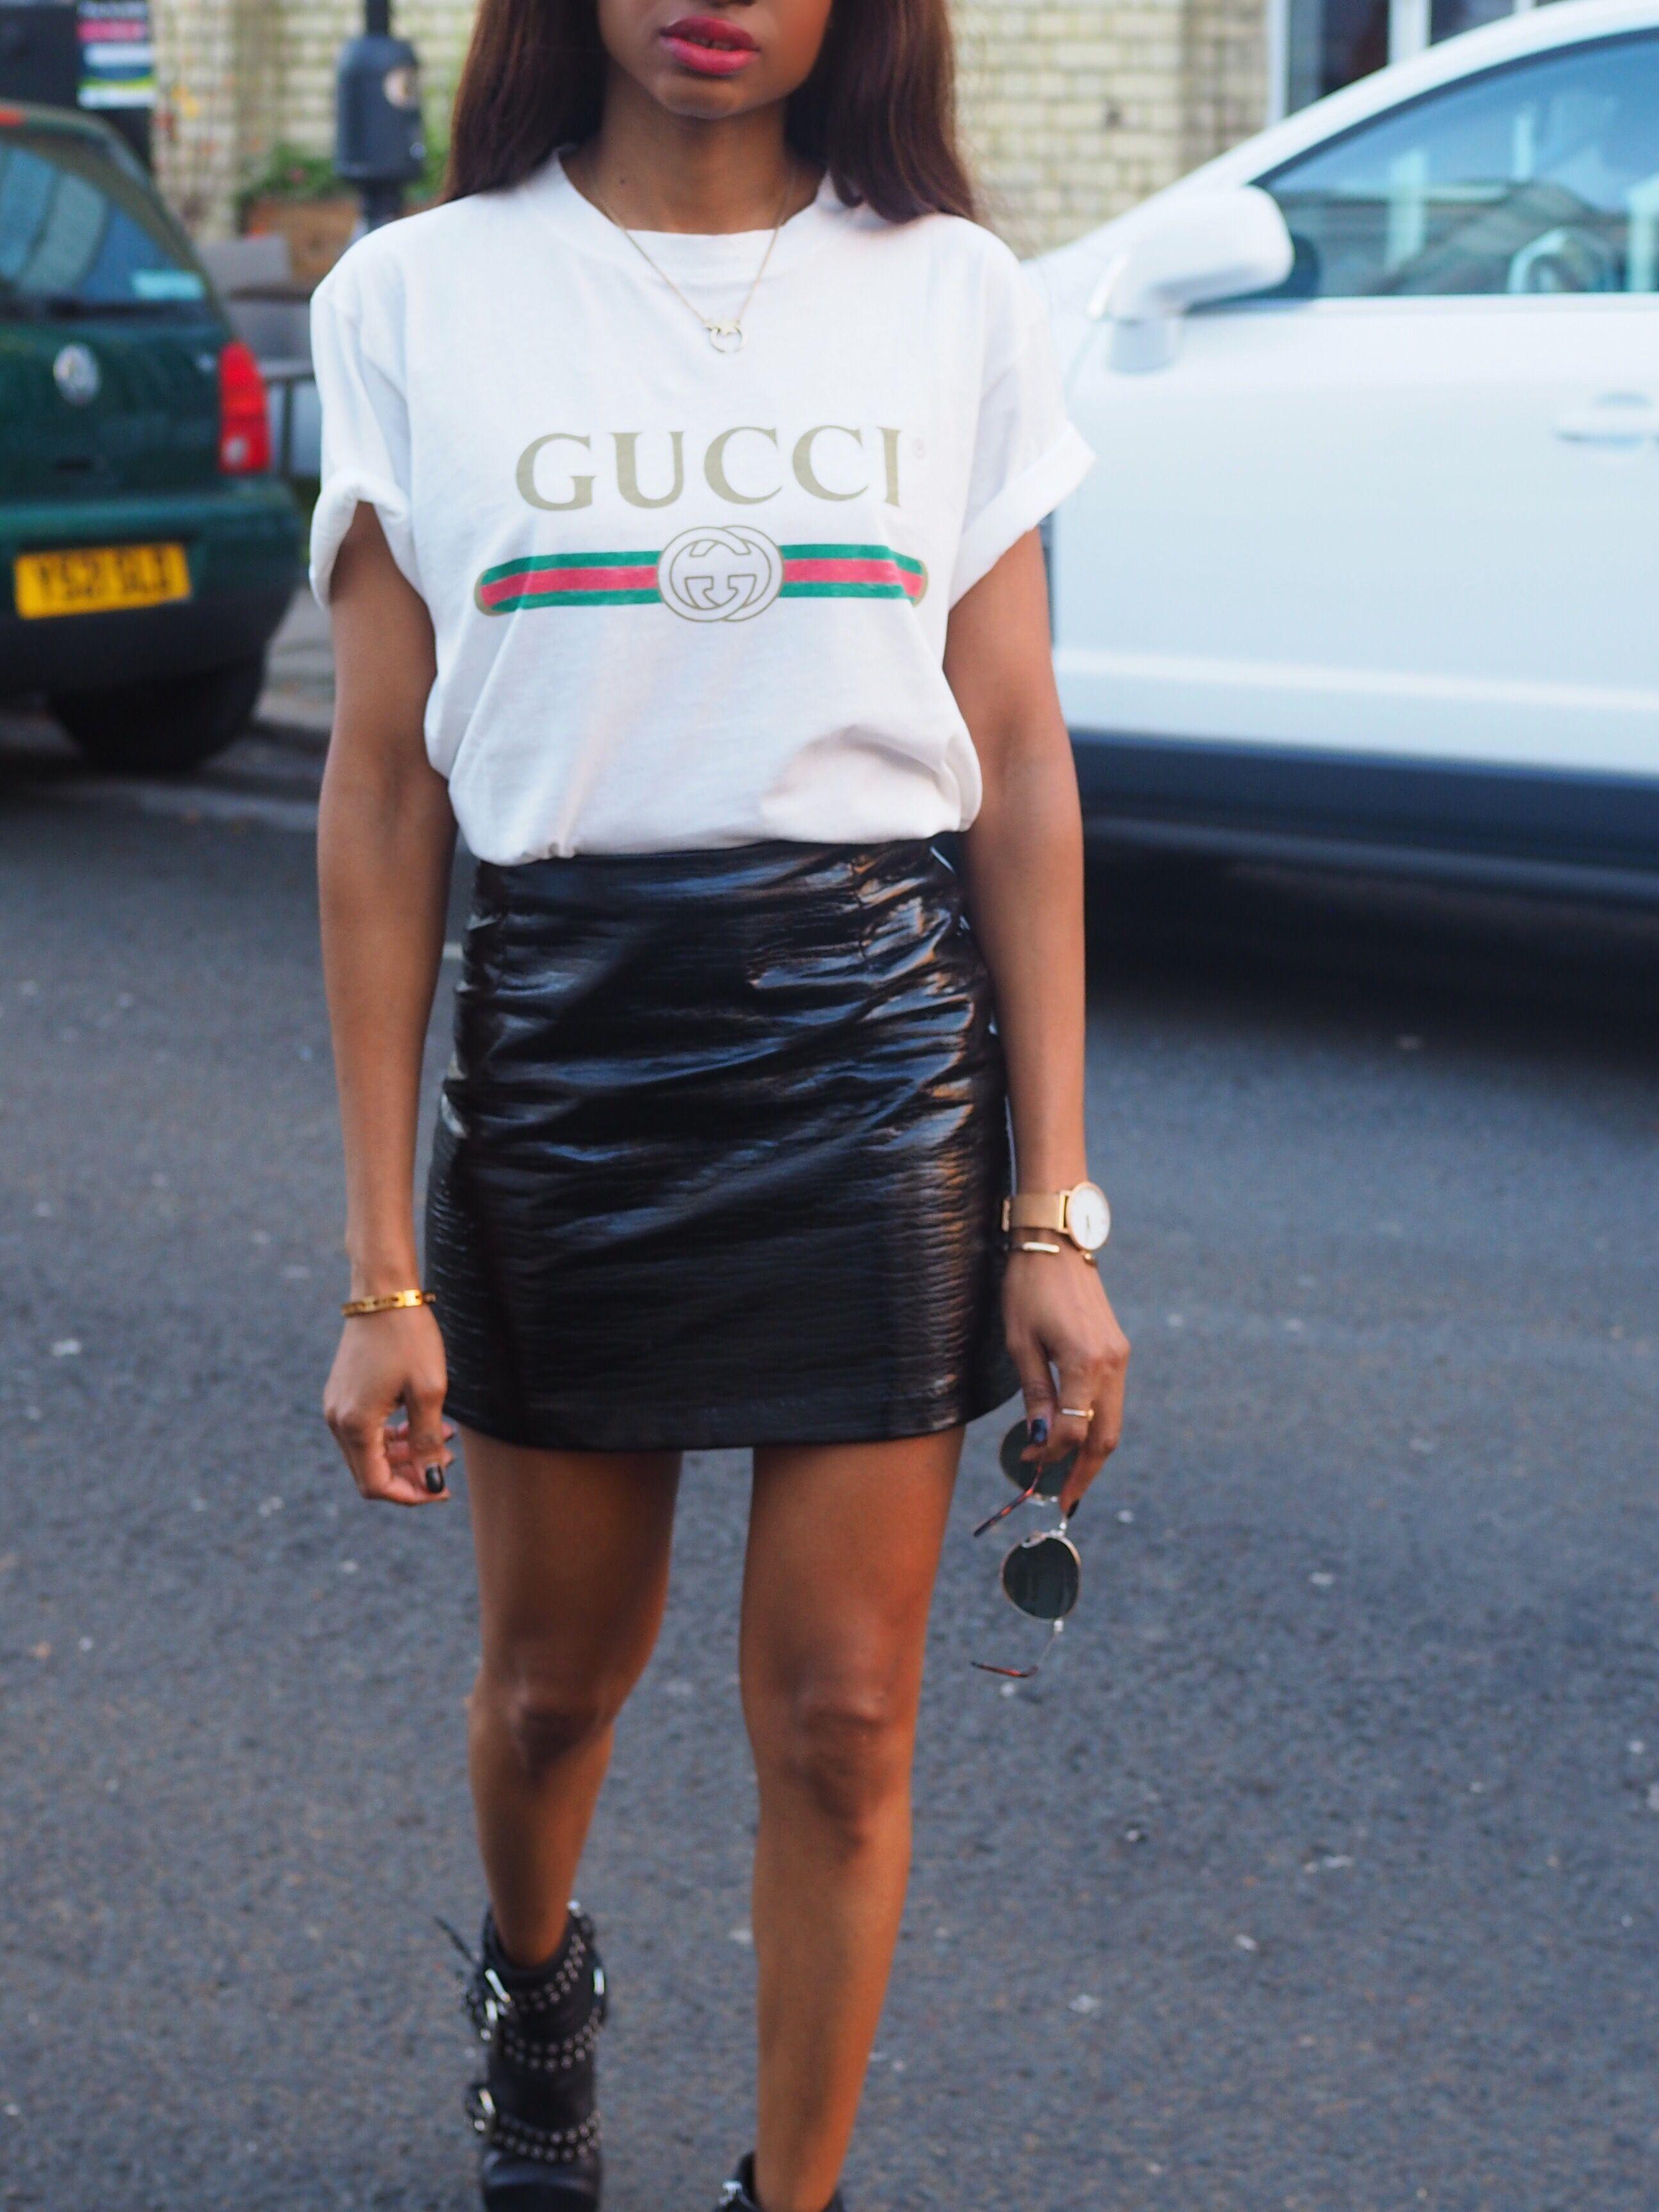 43266e2fb100 gucci t-shirt womens-ootd-gucci logo-gucci-ss17-gucci -autumn-winter-2017-gucci paris fashion week-asos-black -leather-skirt-topshop-black-pvc-leather-skirt- ...